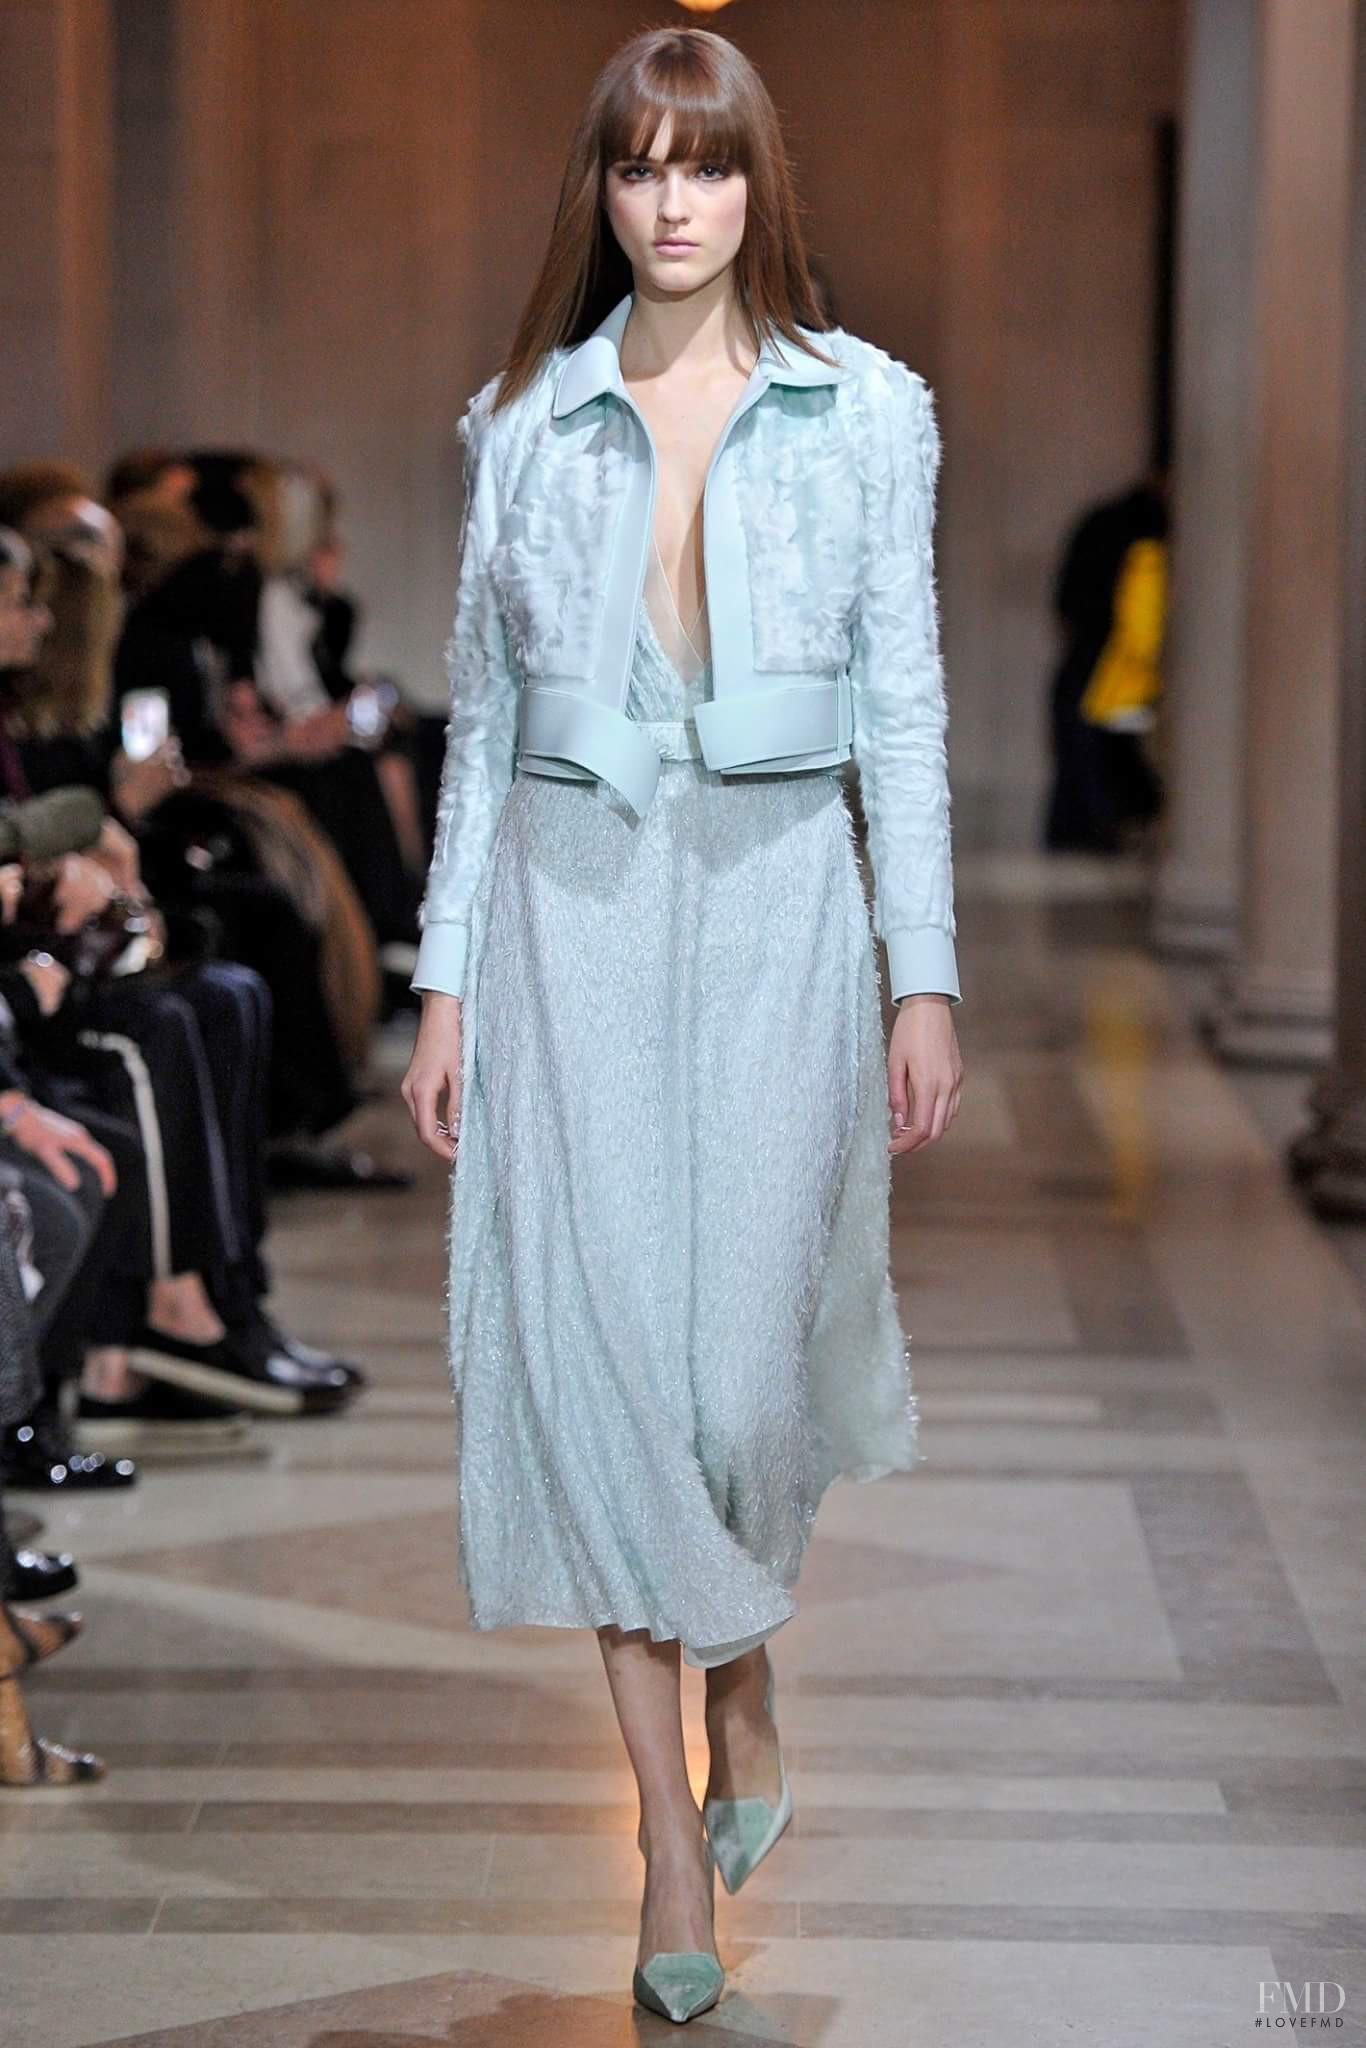 Carolina herrera international fashion designer Carolina Herrera, 35 years of Fashion